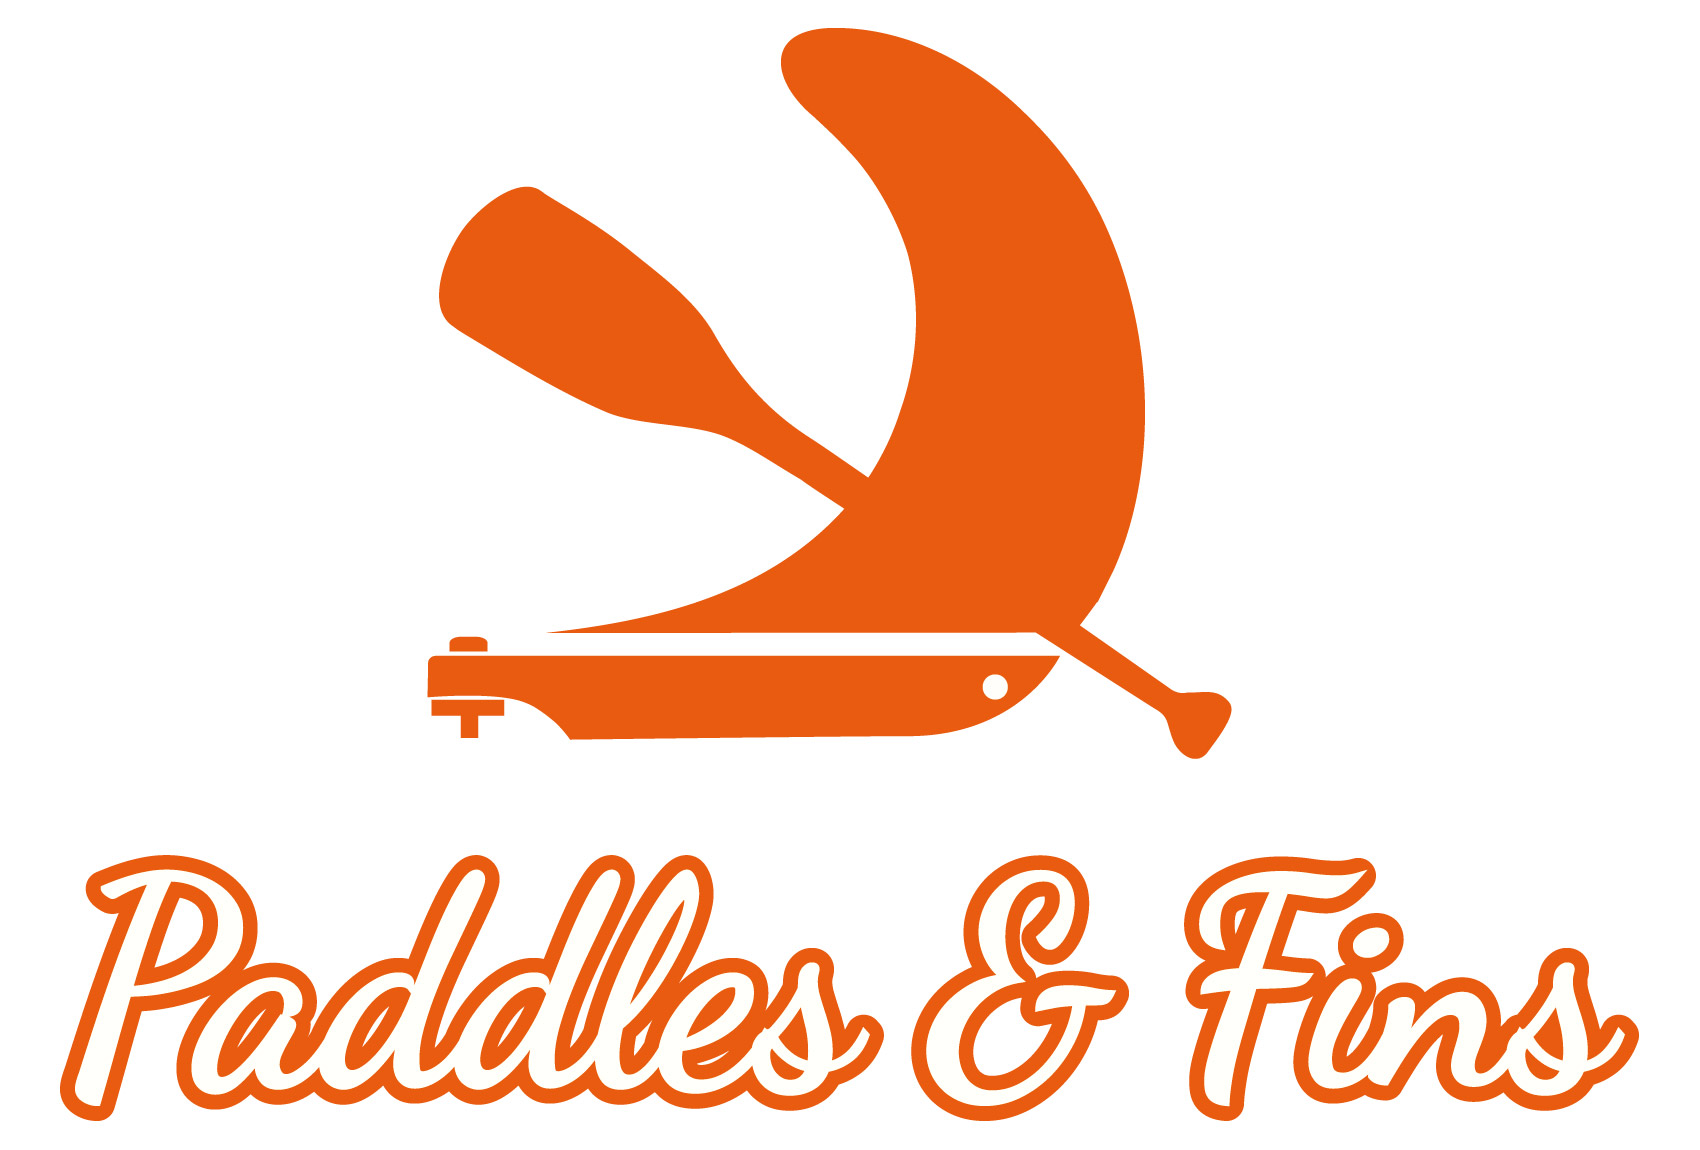 Paddlesandfins.de